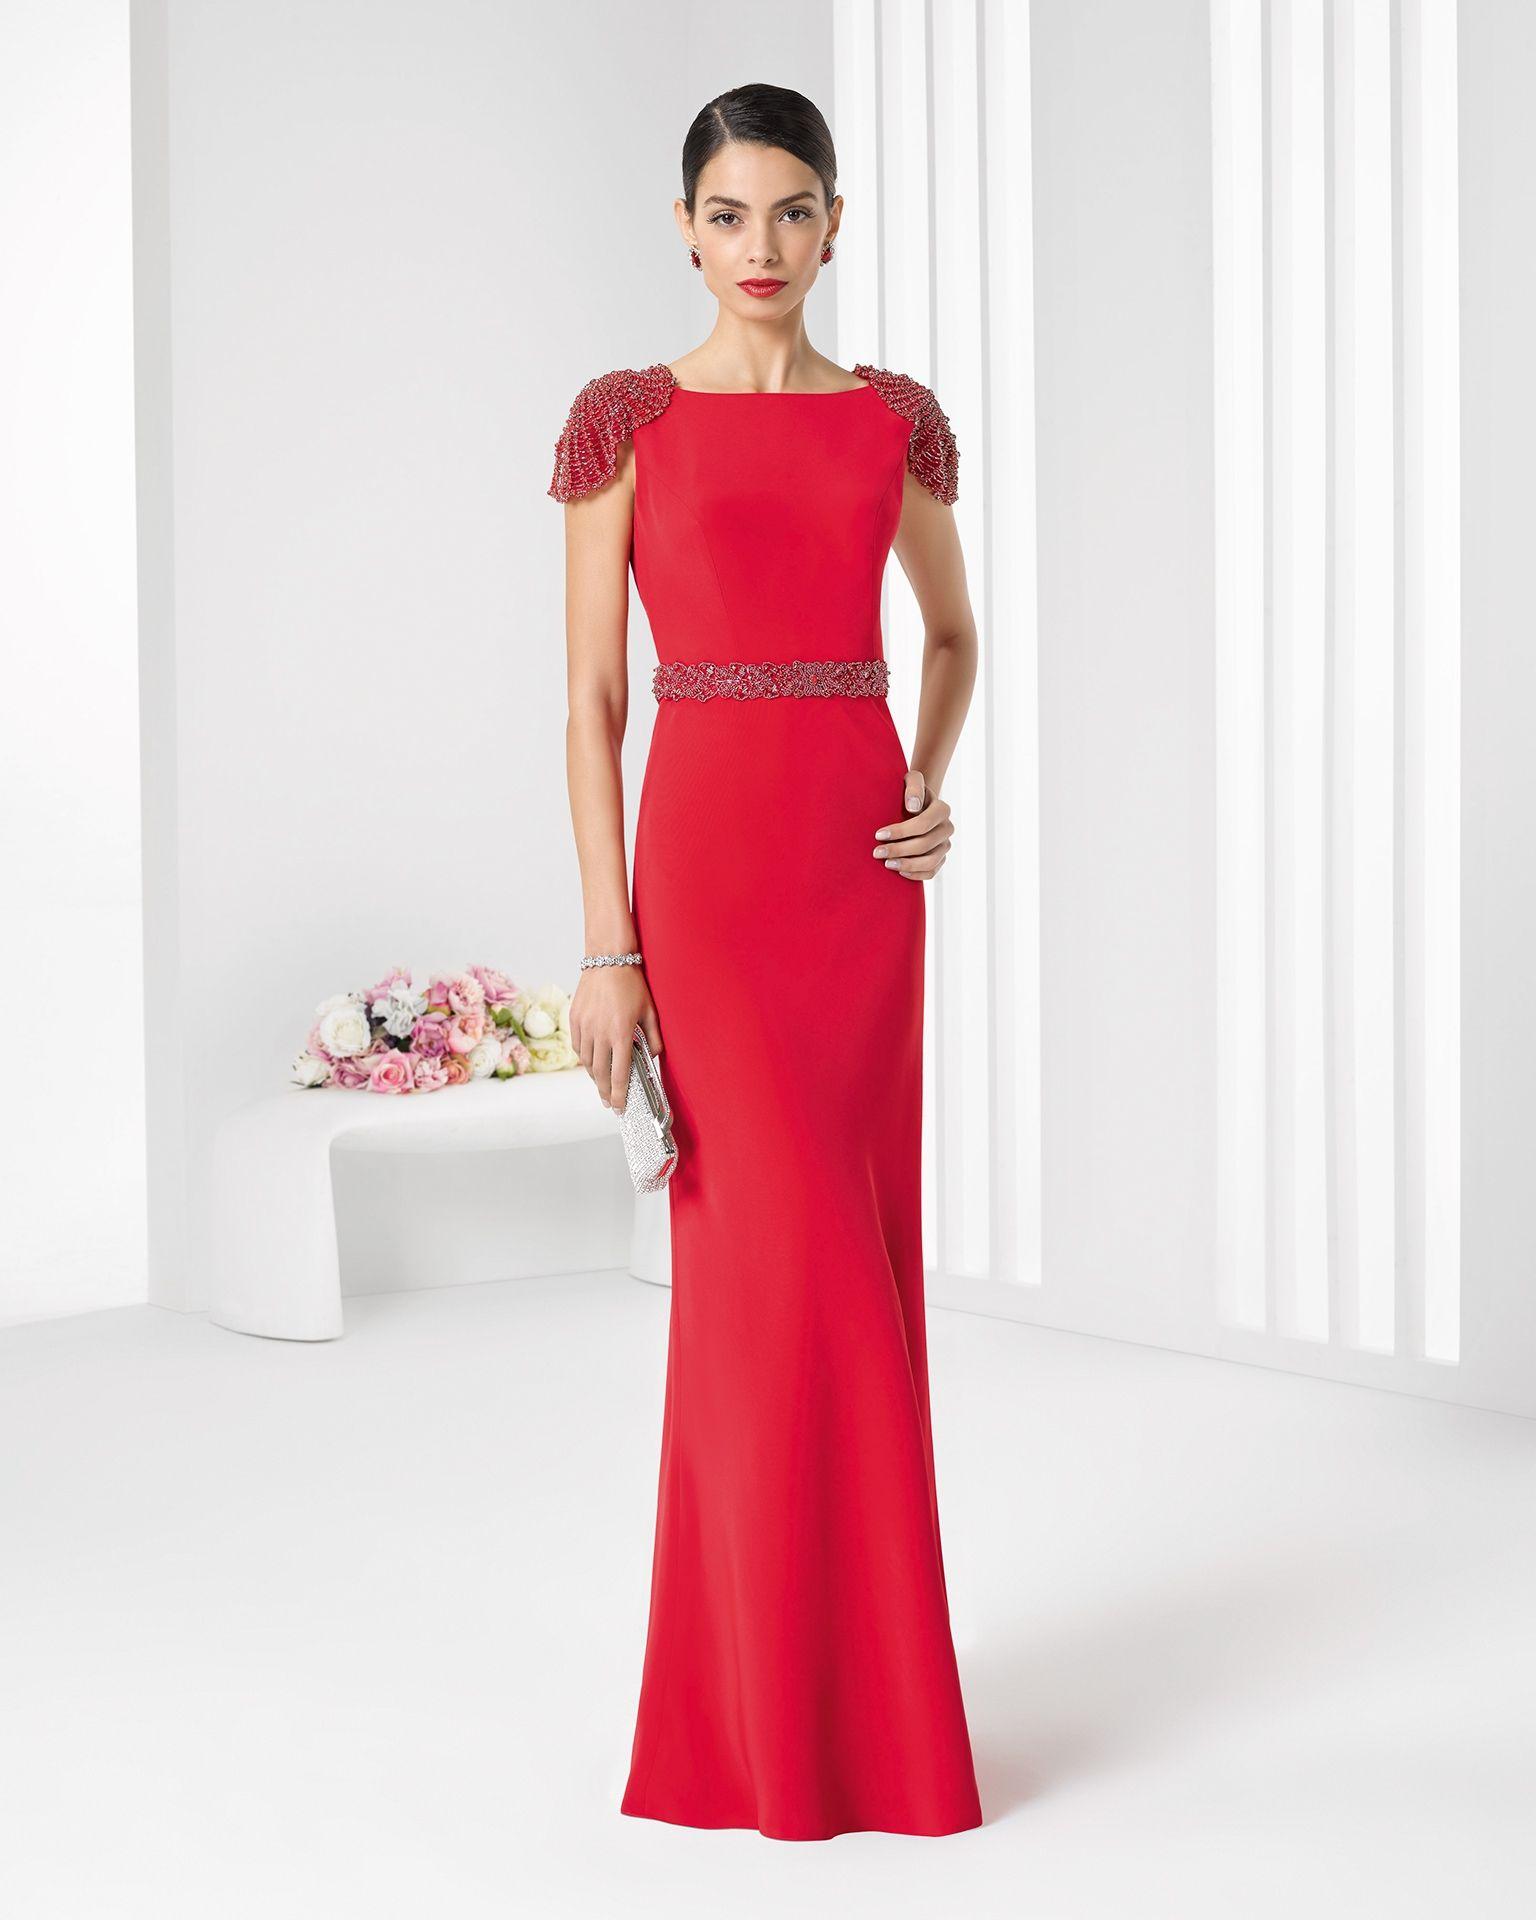 7f57ebd37b 2016 9T190 COCKTAIL ROSA CLARA (Vestido de Fiesta). Diseñador  Rosa Clará.